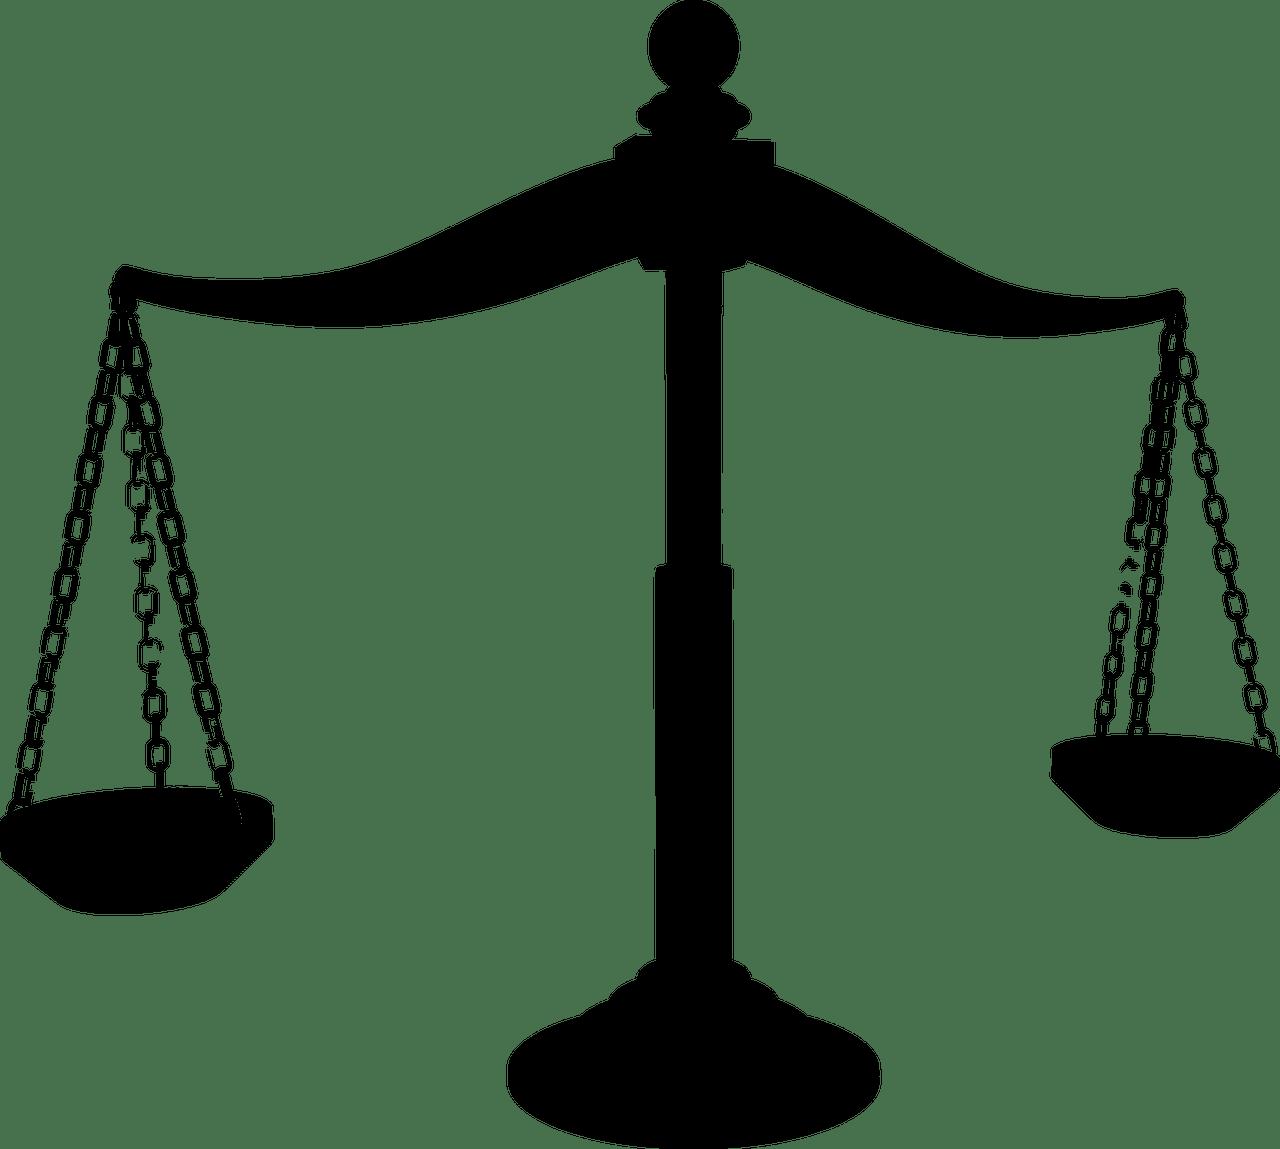 Laws clipart balance scale, Laws balance scale Transparent